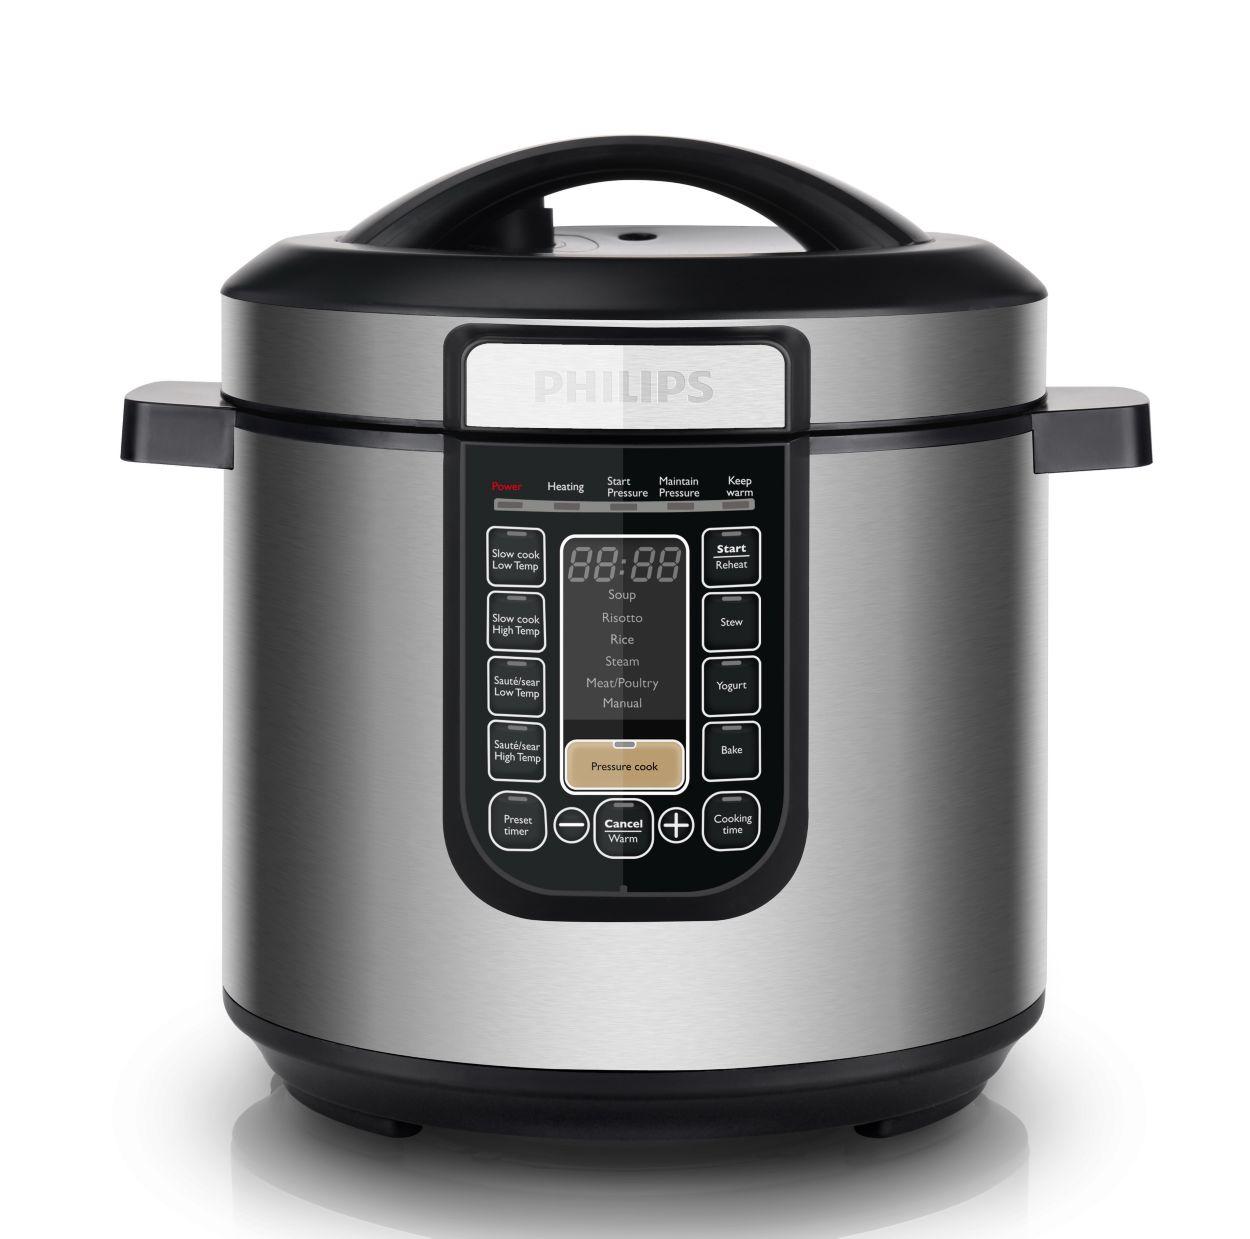 Harga Jual MODENA Gas Rice Cooker CR1001G | Sejuk Elektronik